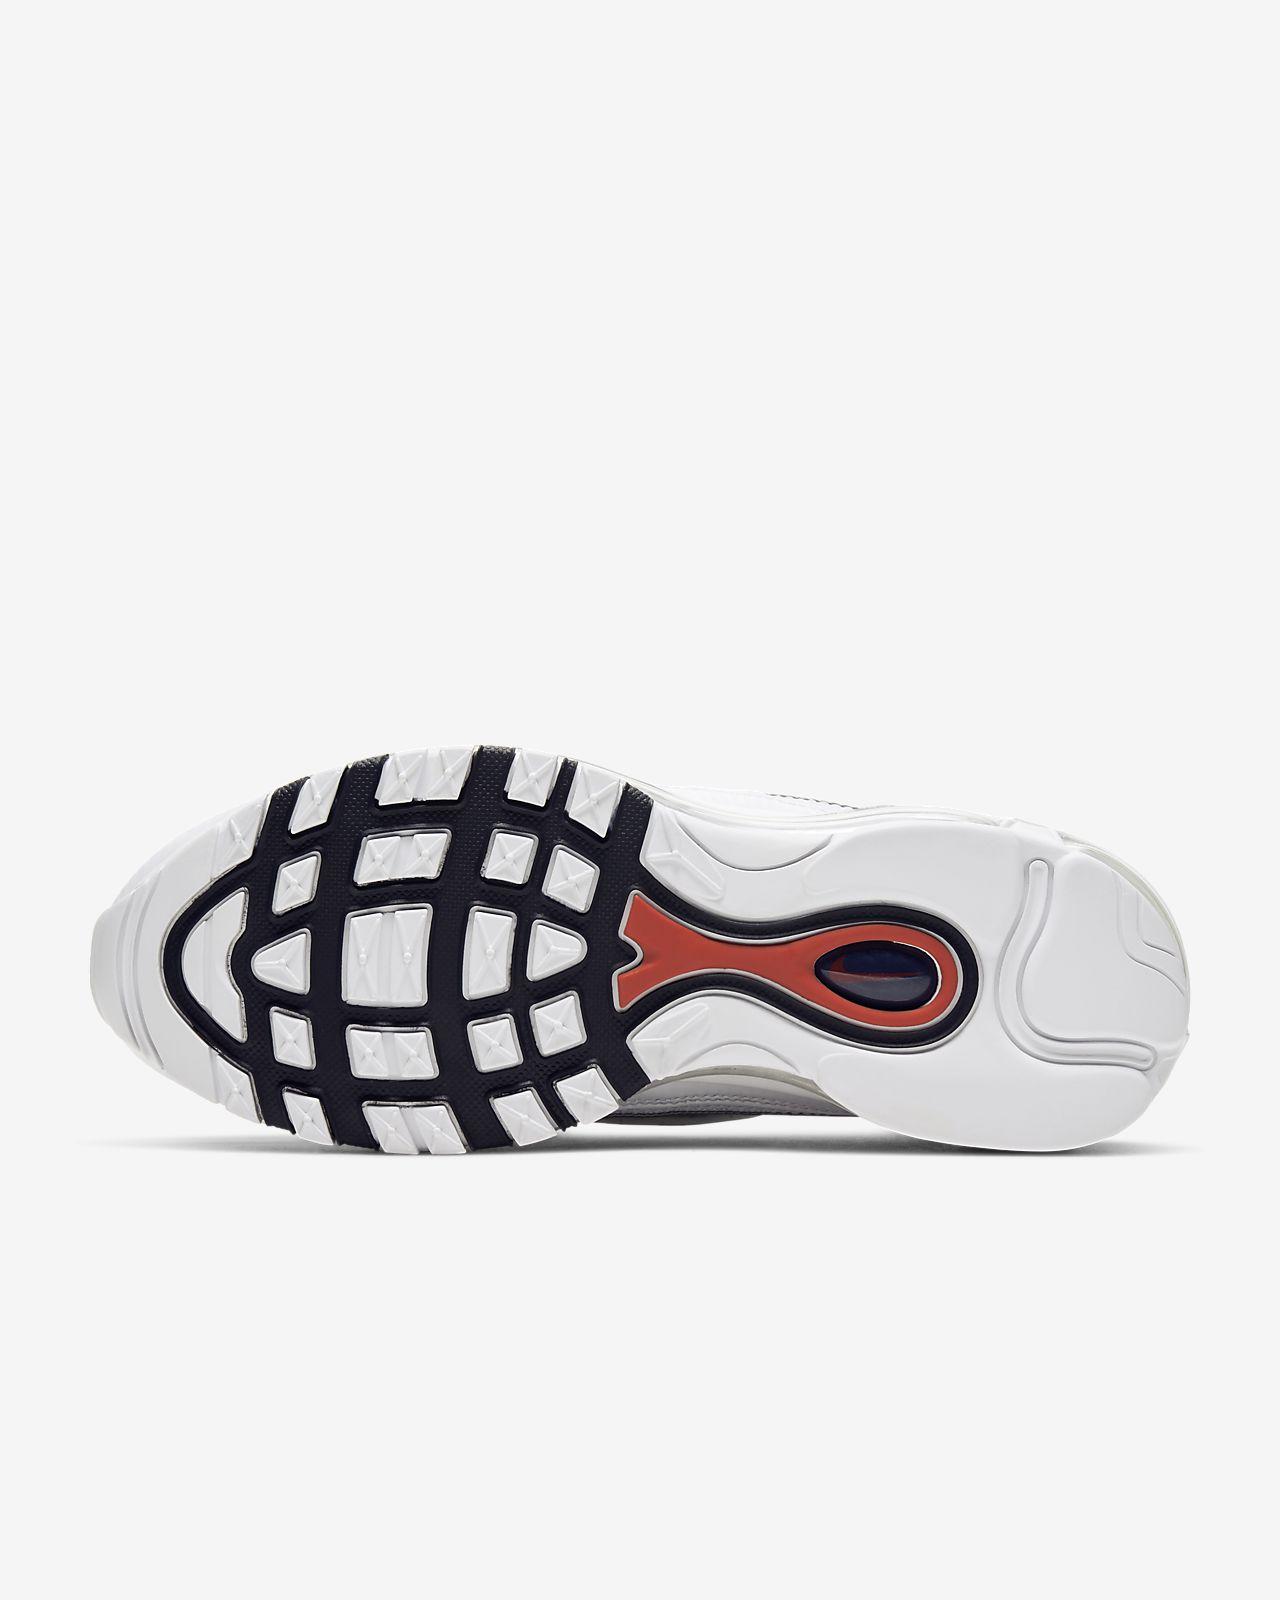 Nike Air Max 98 Women's Shoe. Nike NL